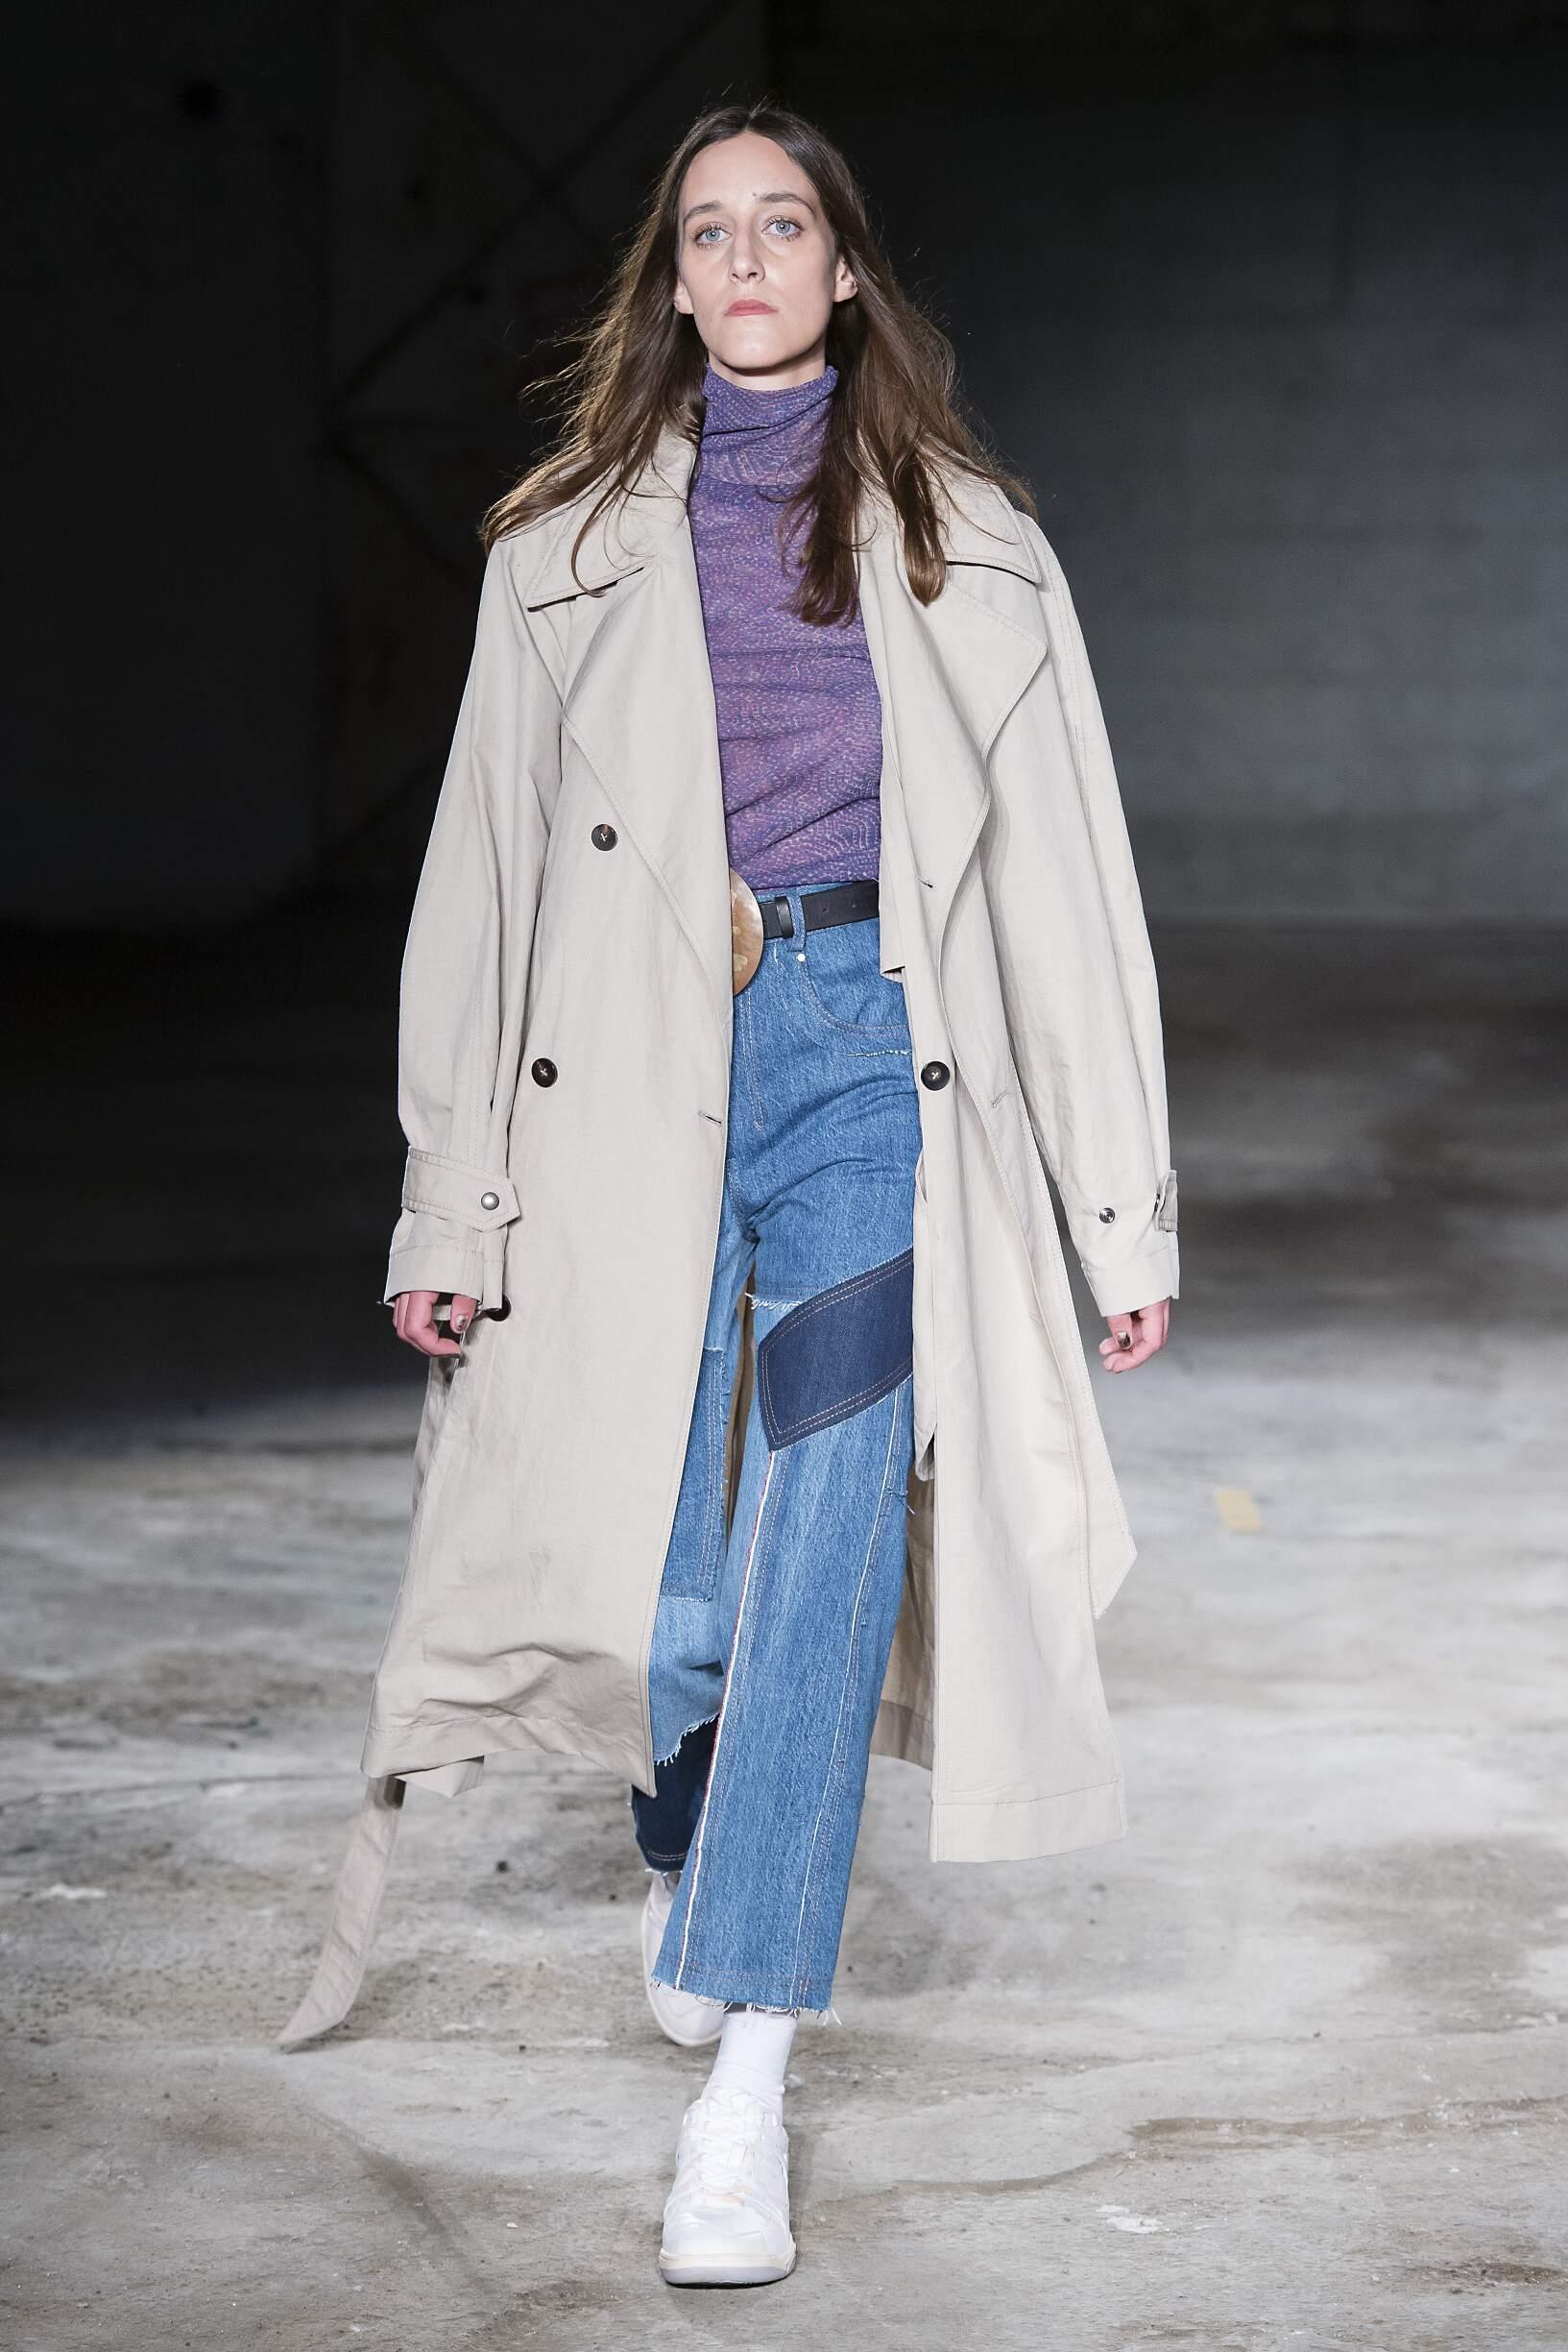 Fashion Woman Model Damir Doma Catwalk